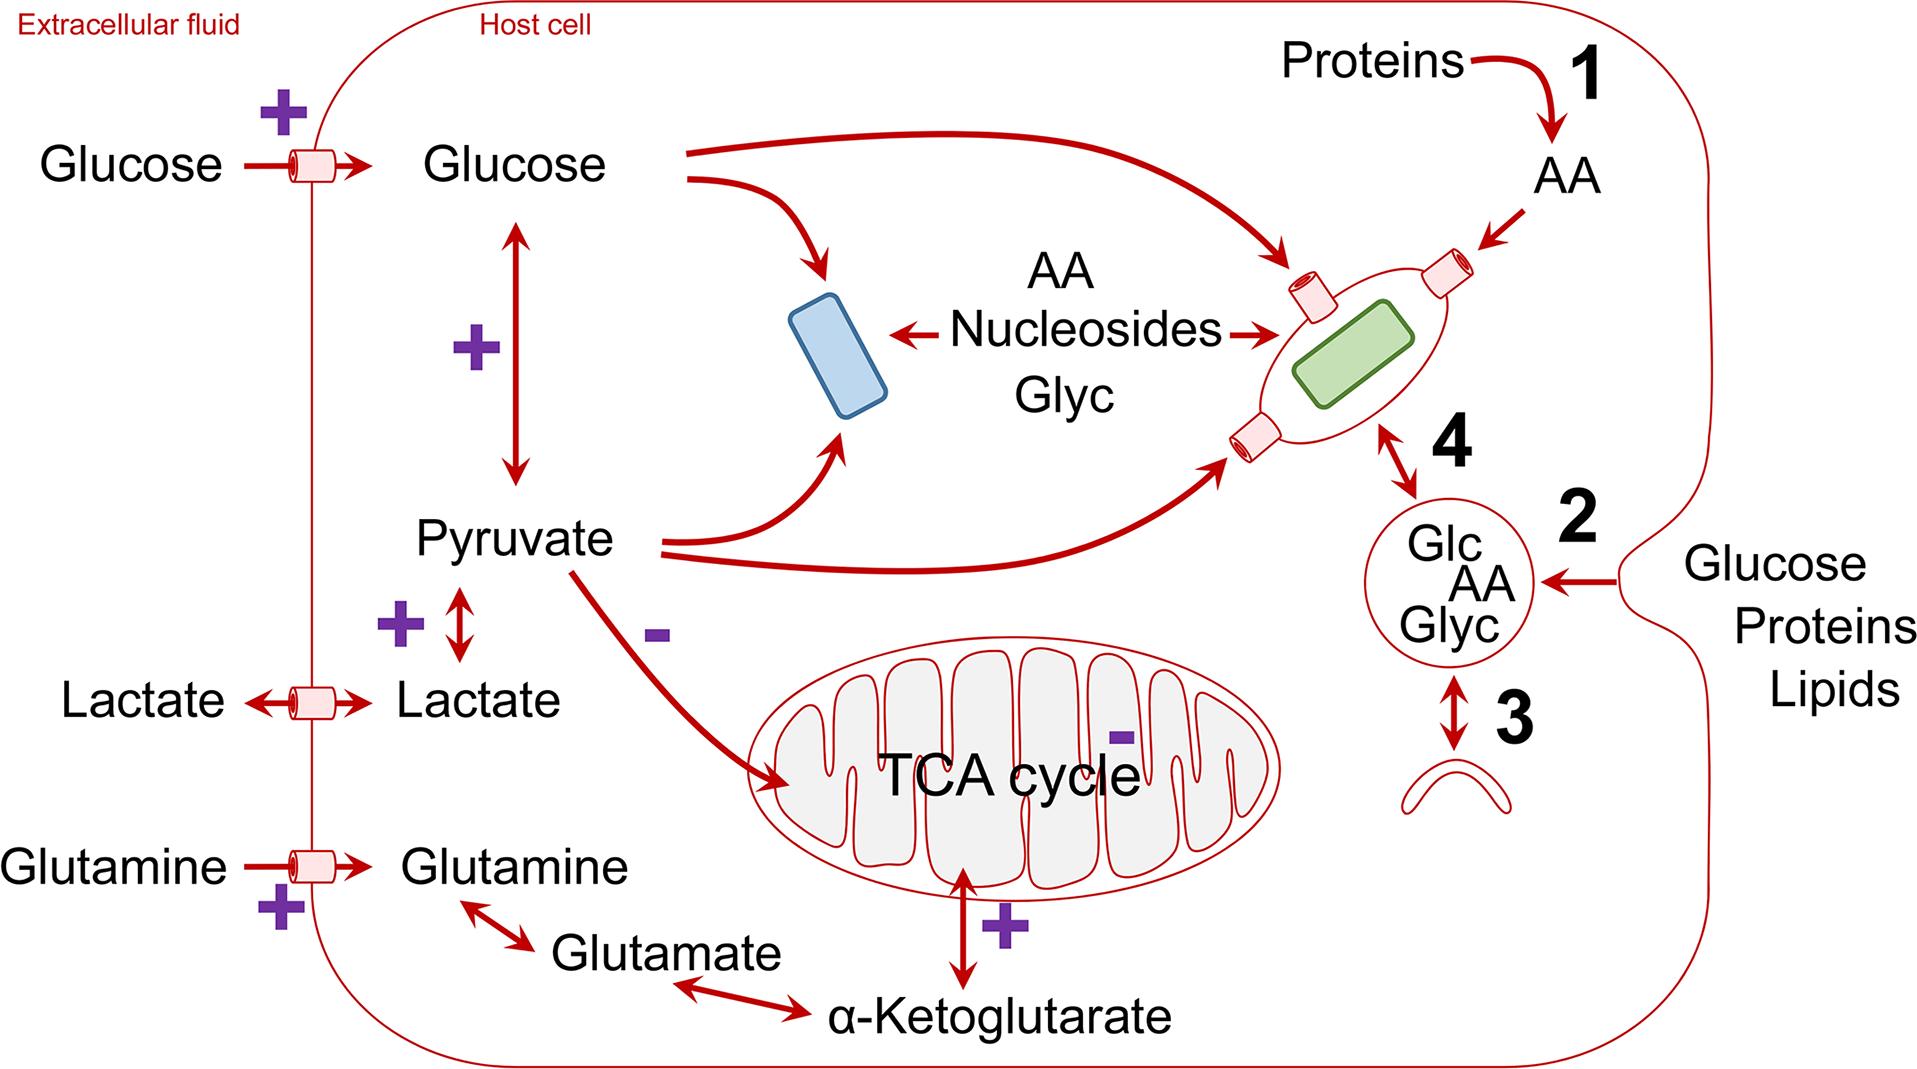 Schematic overview of host nutrient supply for intracellular pathogens (blue, cytosolic pathogen; green, vacuolar pathogen; AA, amino acids; Glc, glucose; Glyc, glycerol).